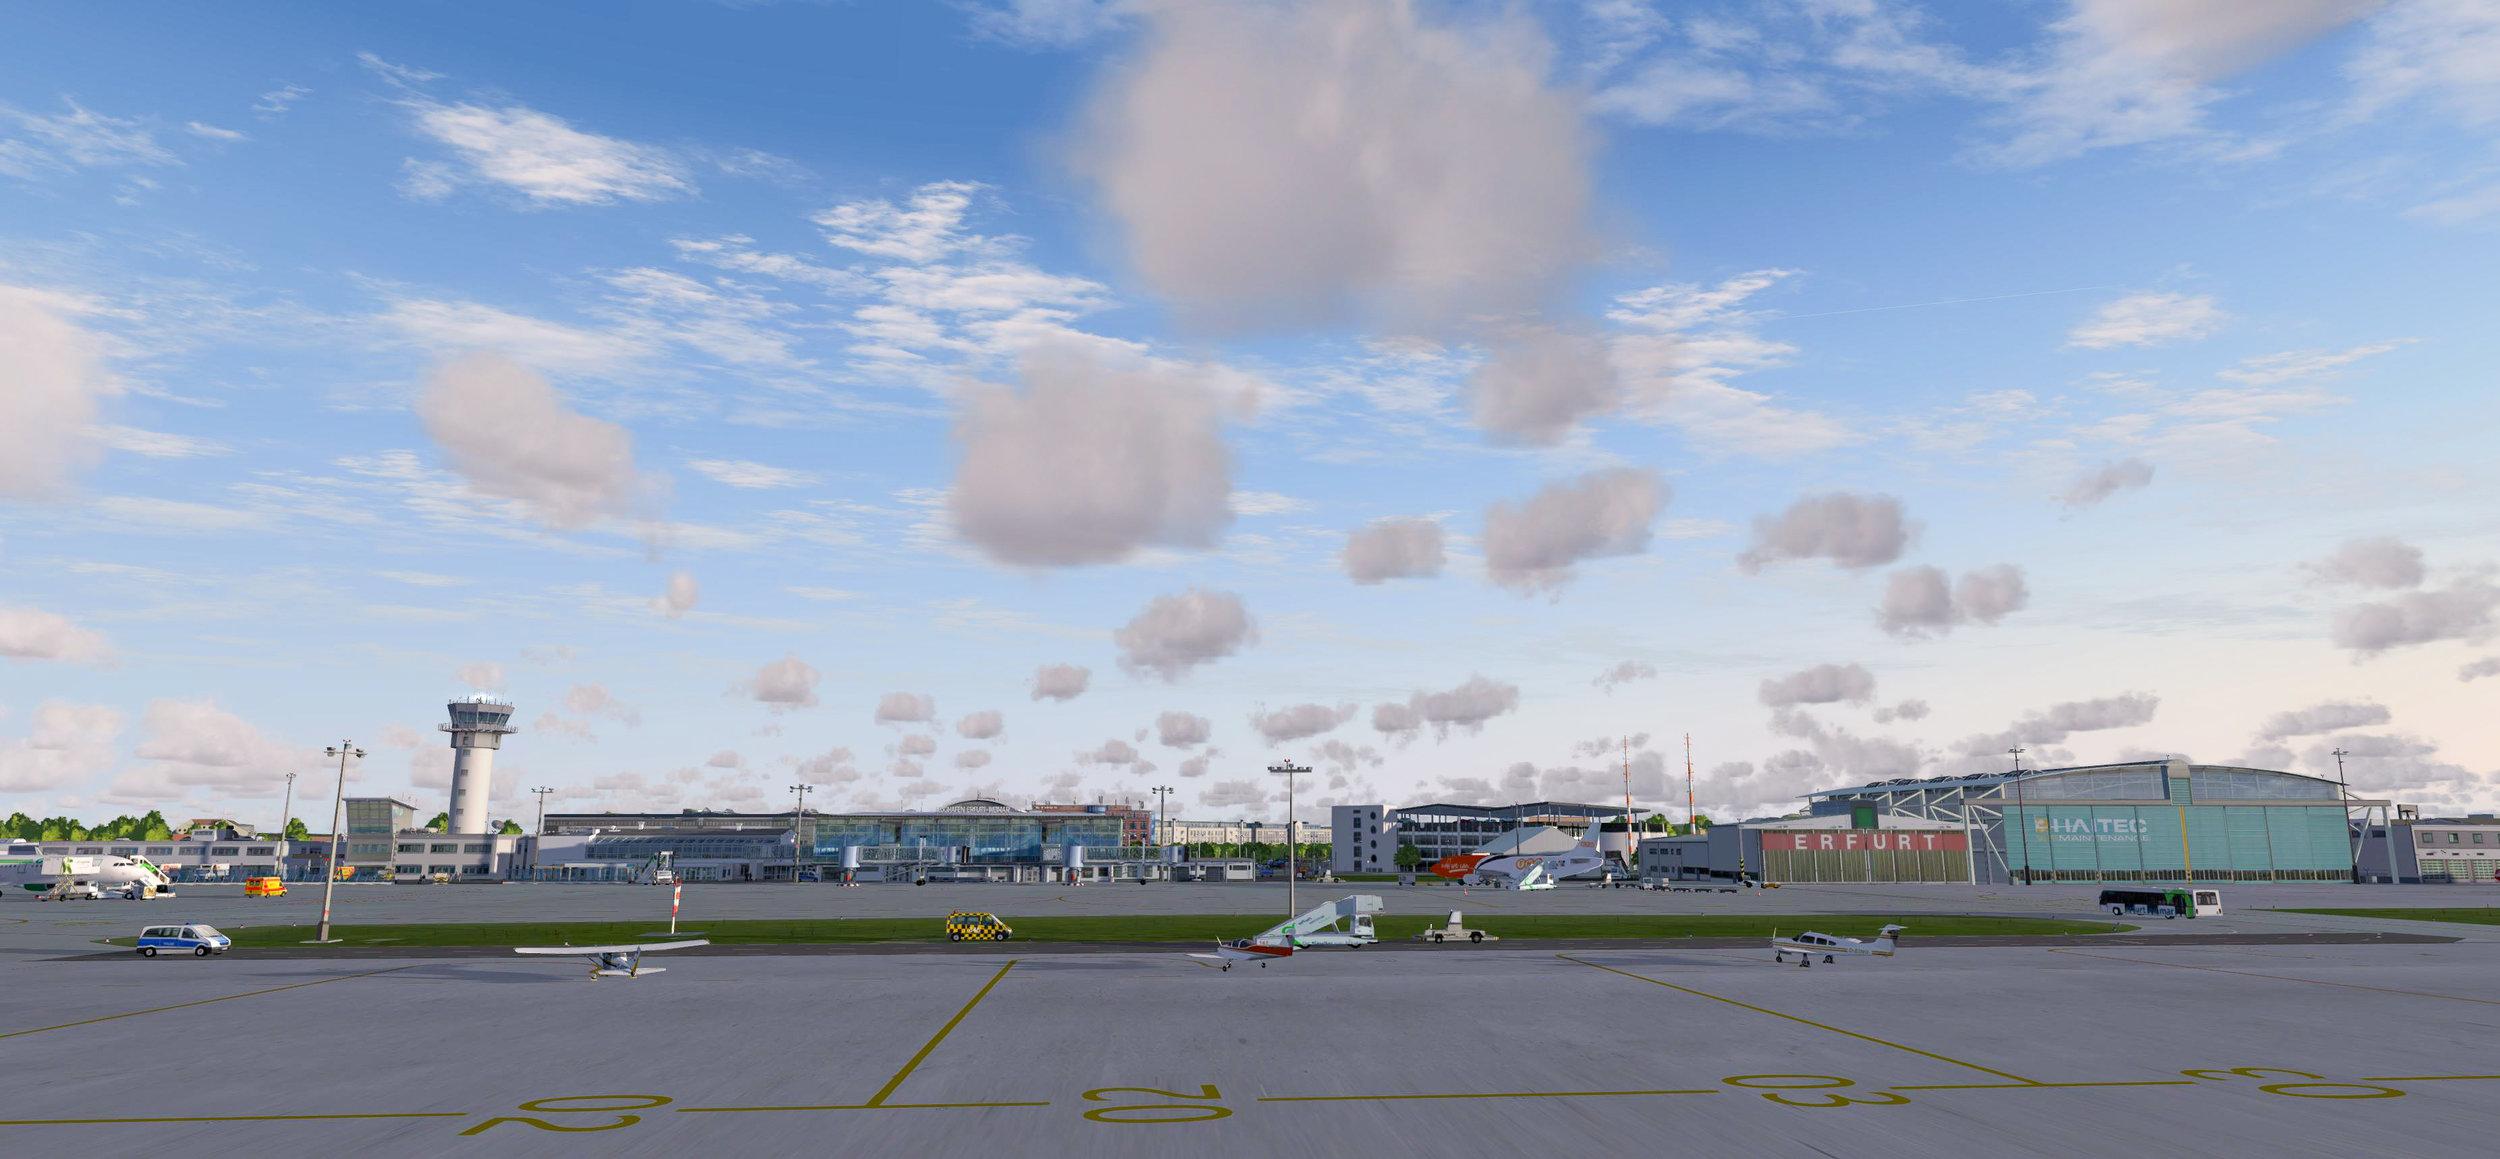 Airport_Erfurt_P3Dv4_05.jpg